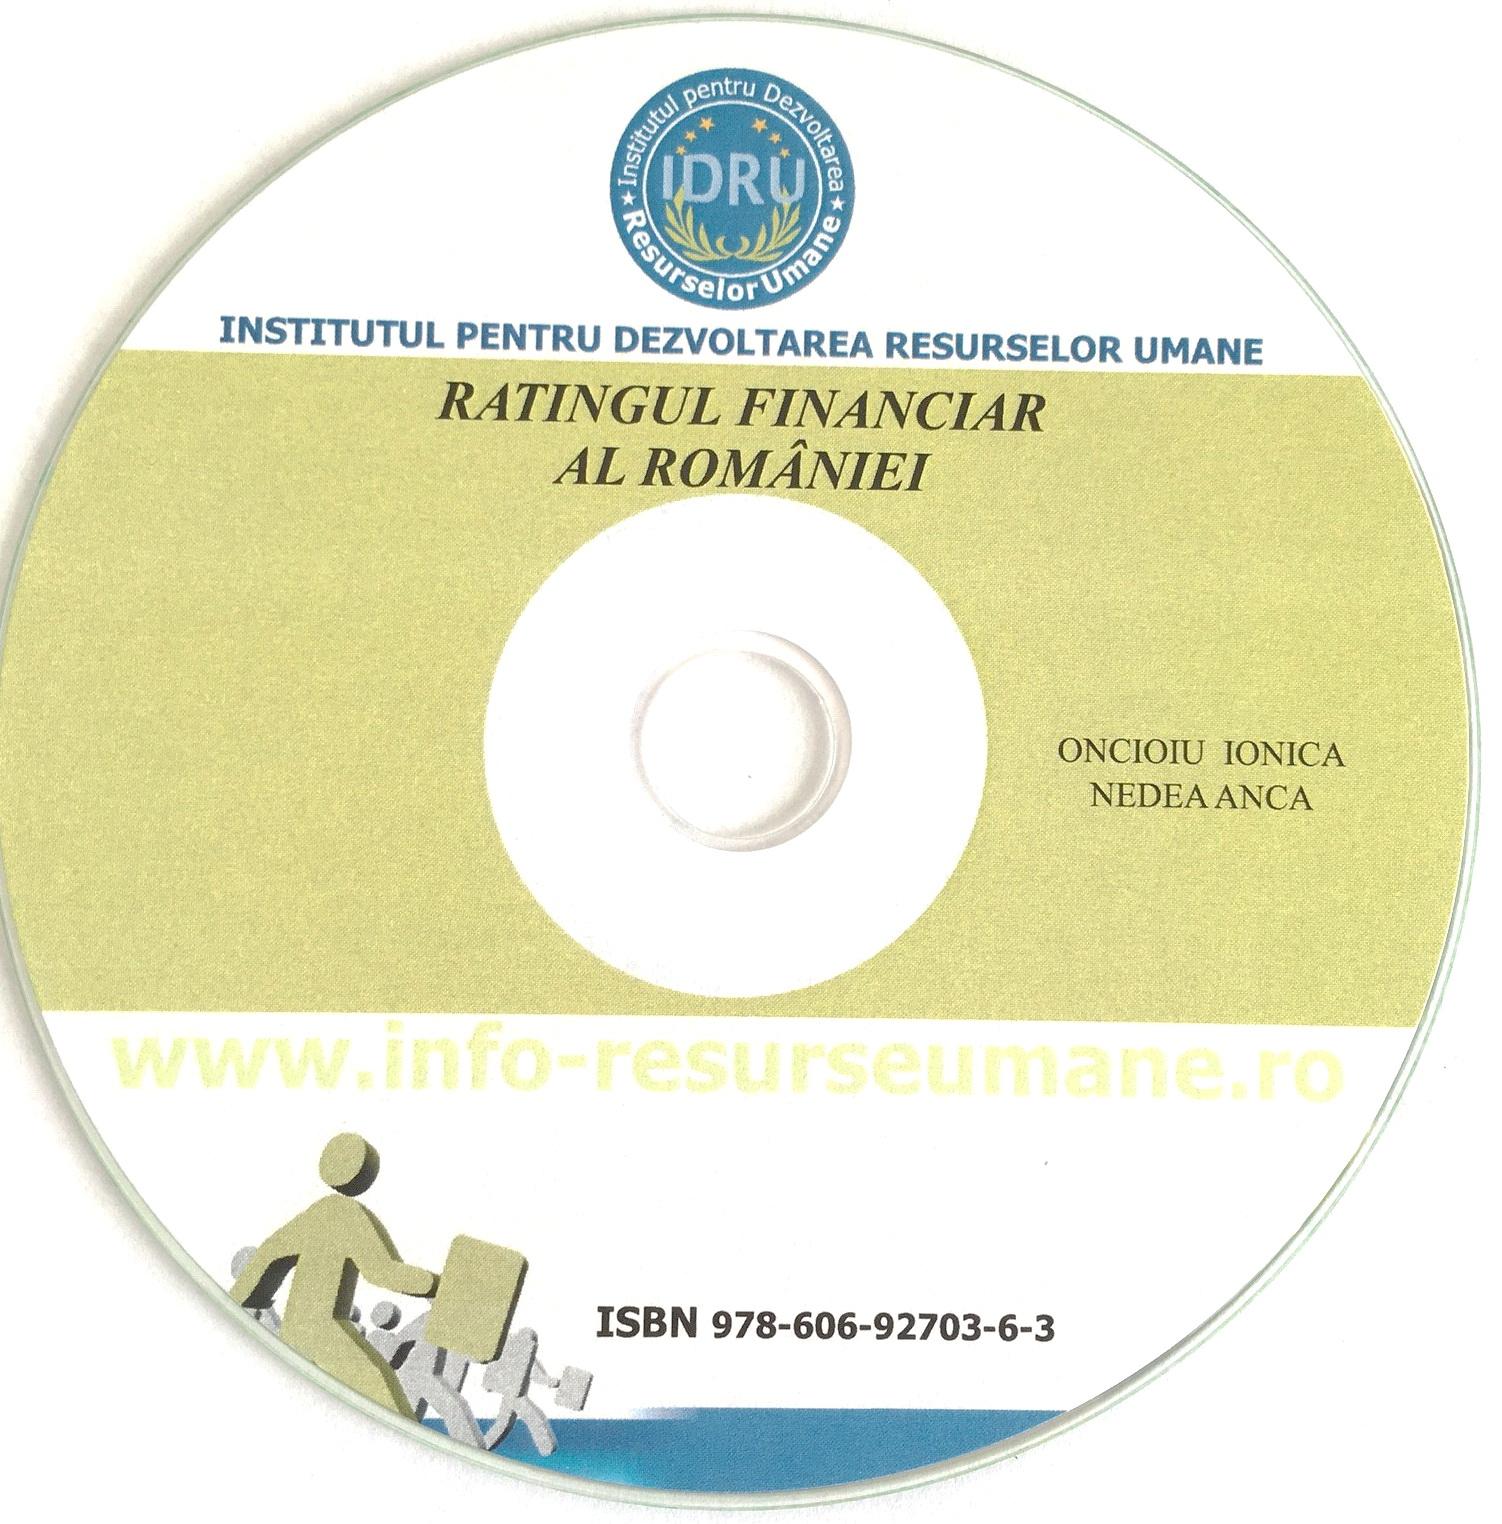 Ratingul financiar al Romaniei